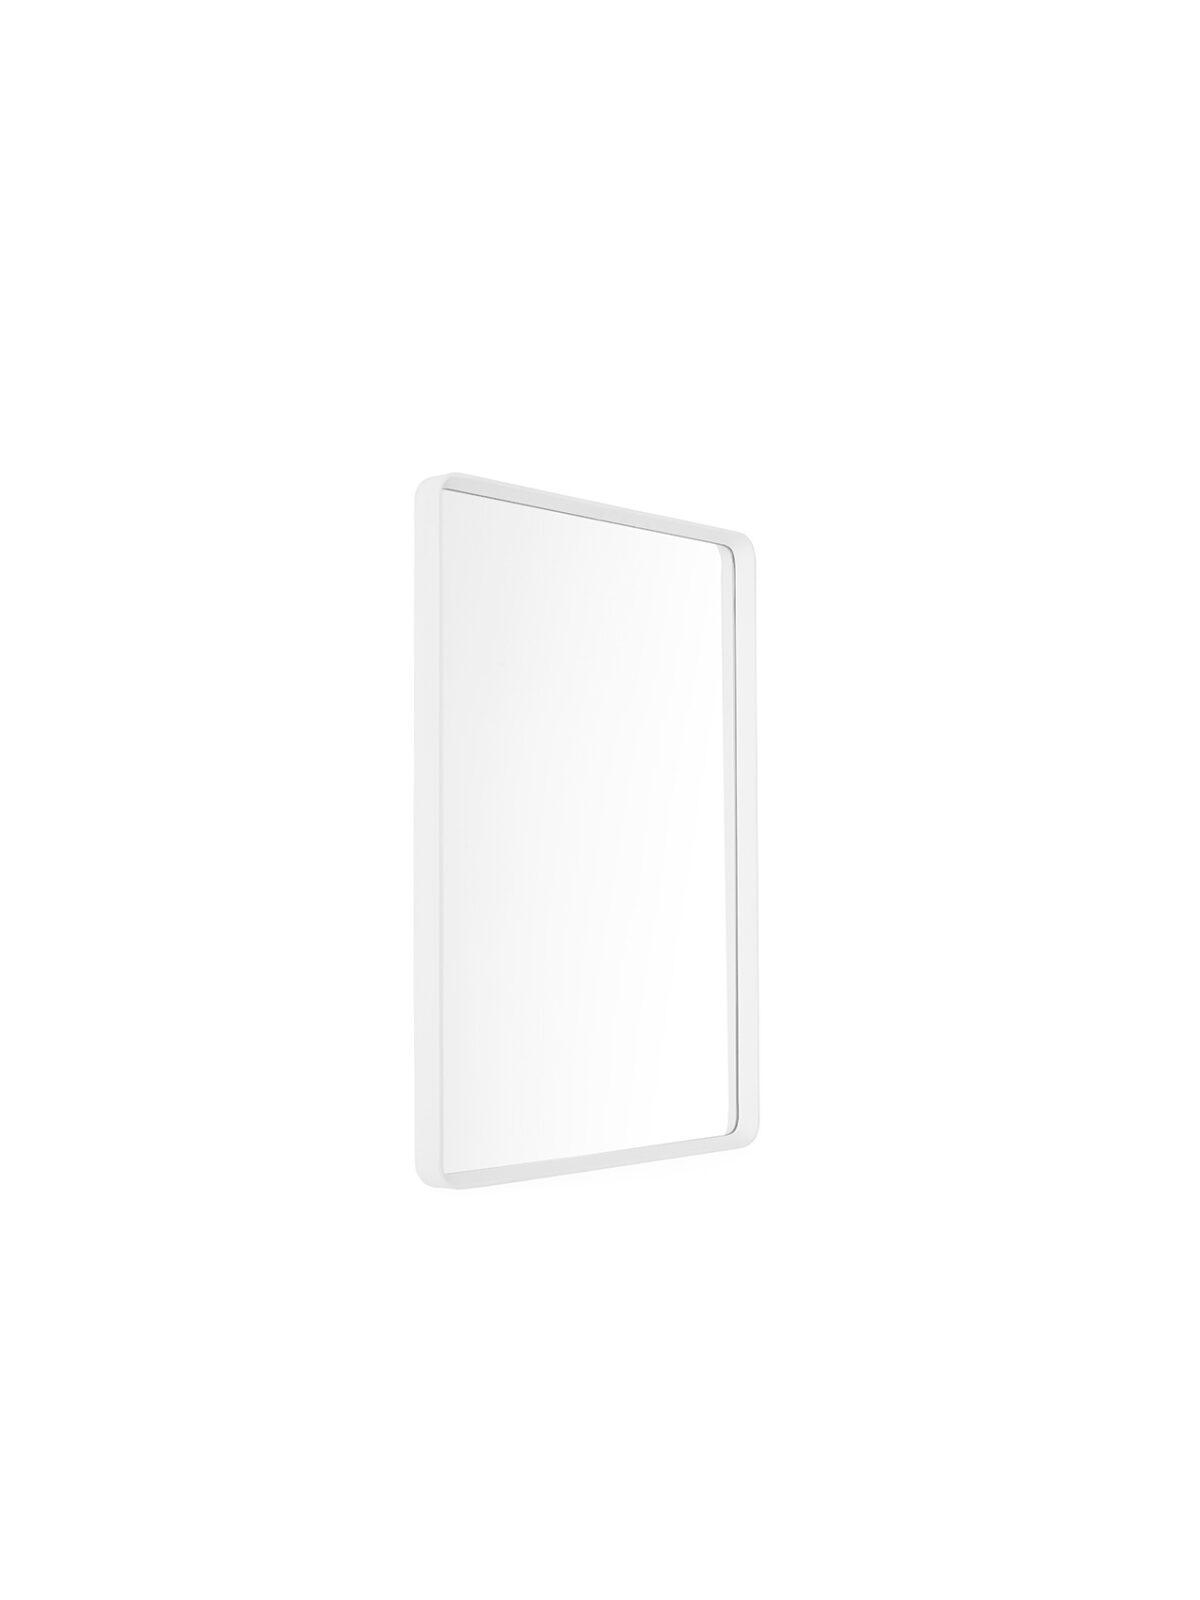 8020639 Norm Mirror Rectangular2019 06 25 10 39 05 221